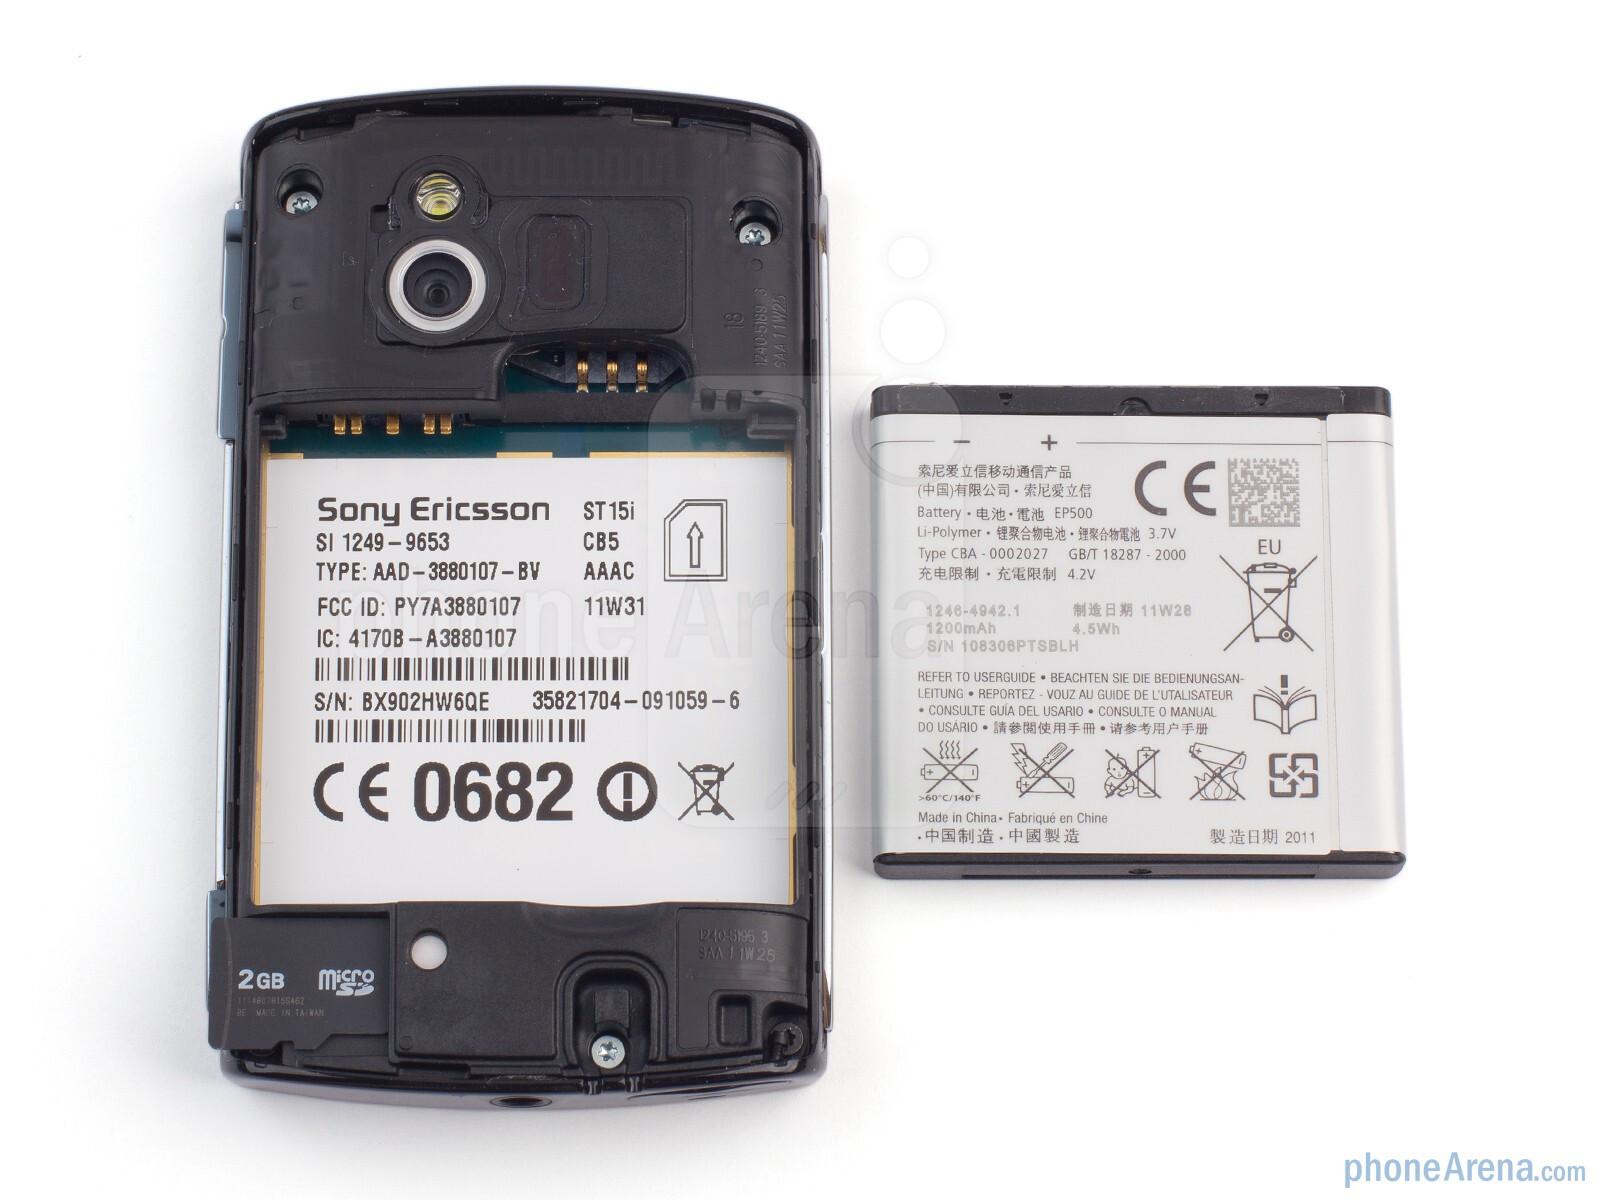 sony ericsson xperia mini review rh phonearena com Sony Ericsson Xperia Pro Sony Ericsson Xperia Latest Model